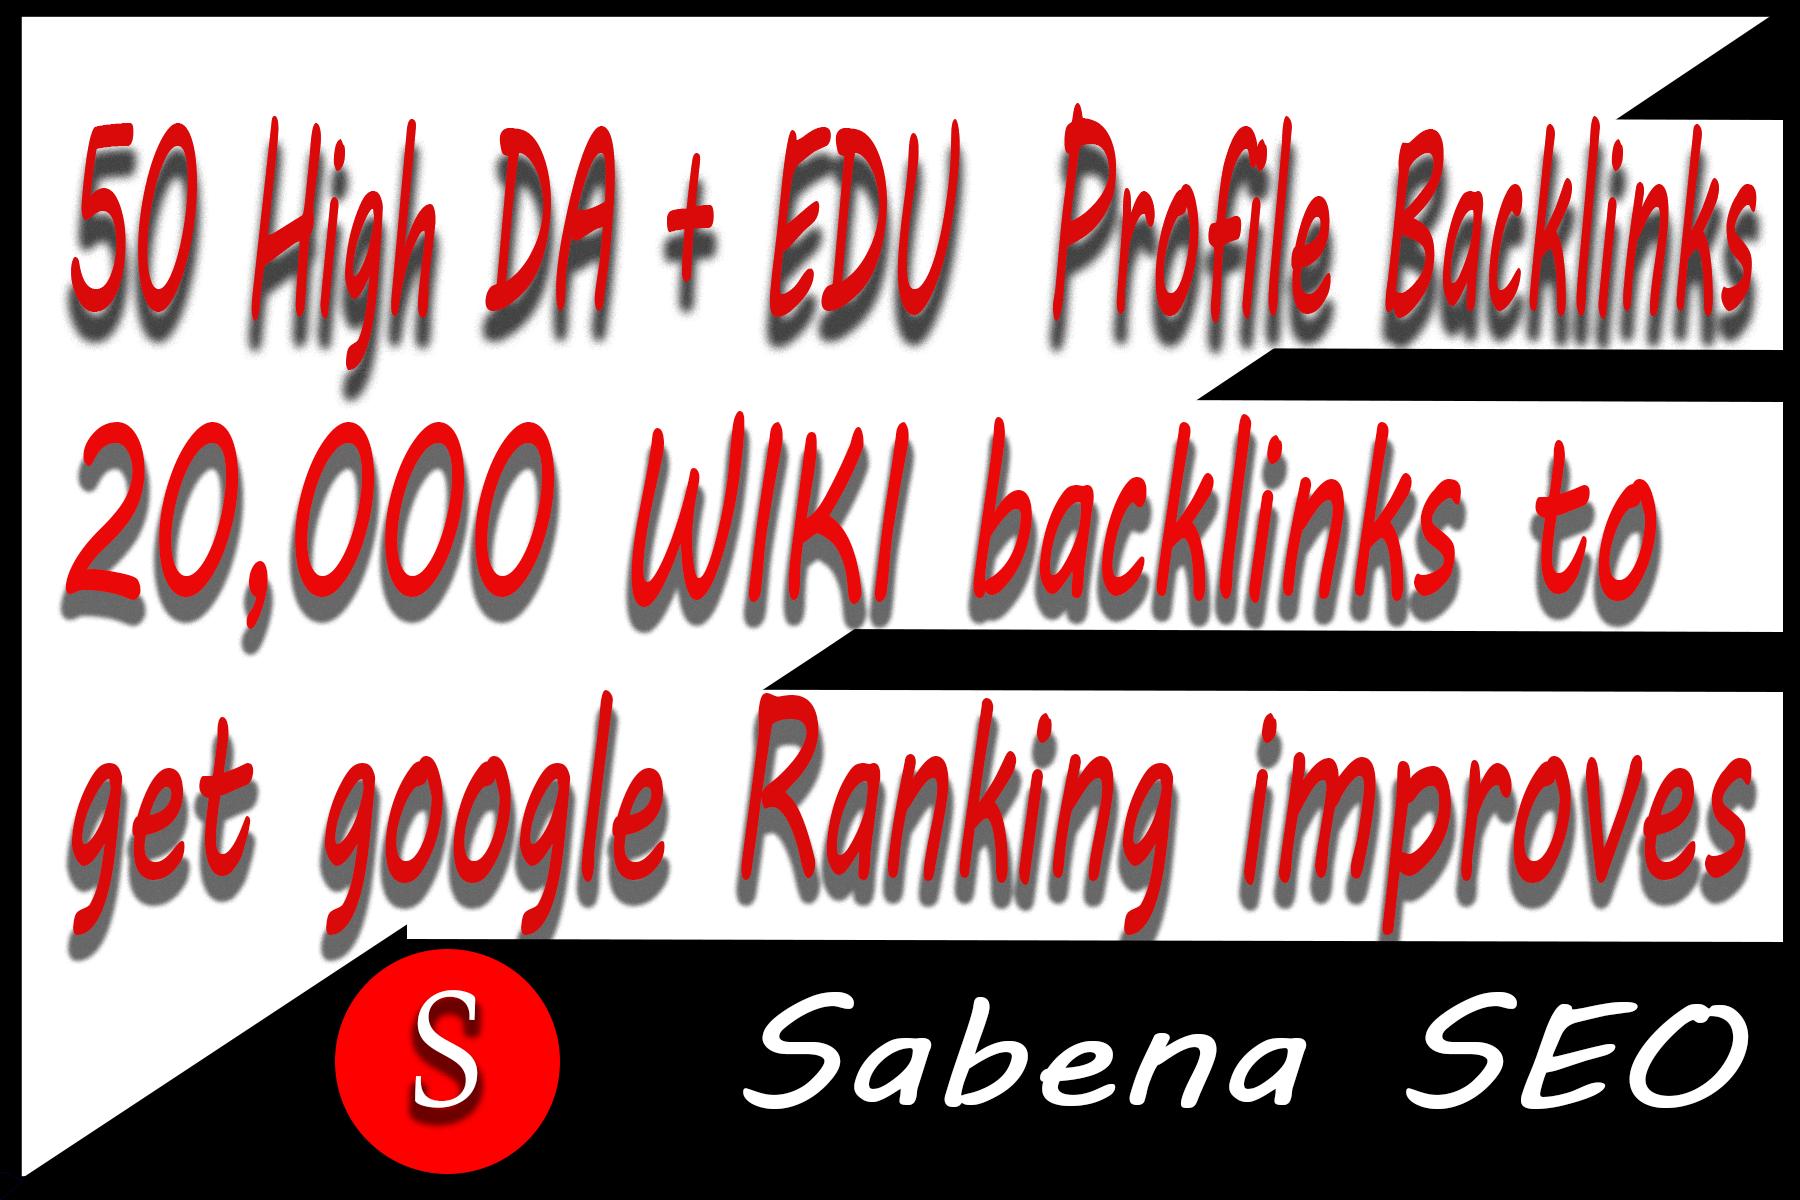 Manual 50 High DA + EDU Profile Backlinks+ 20,000 WIKI backlinks to get google Ranking improves